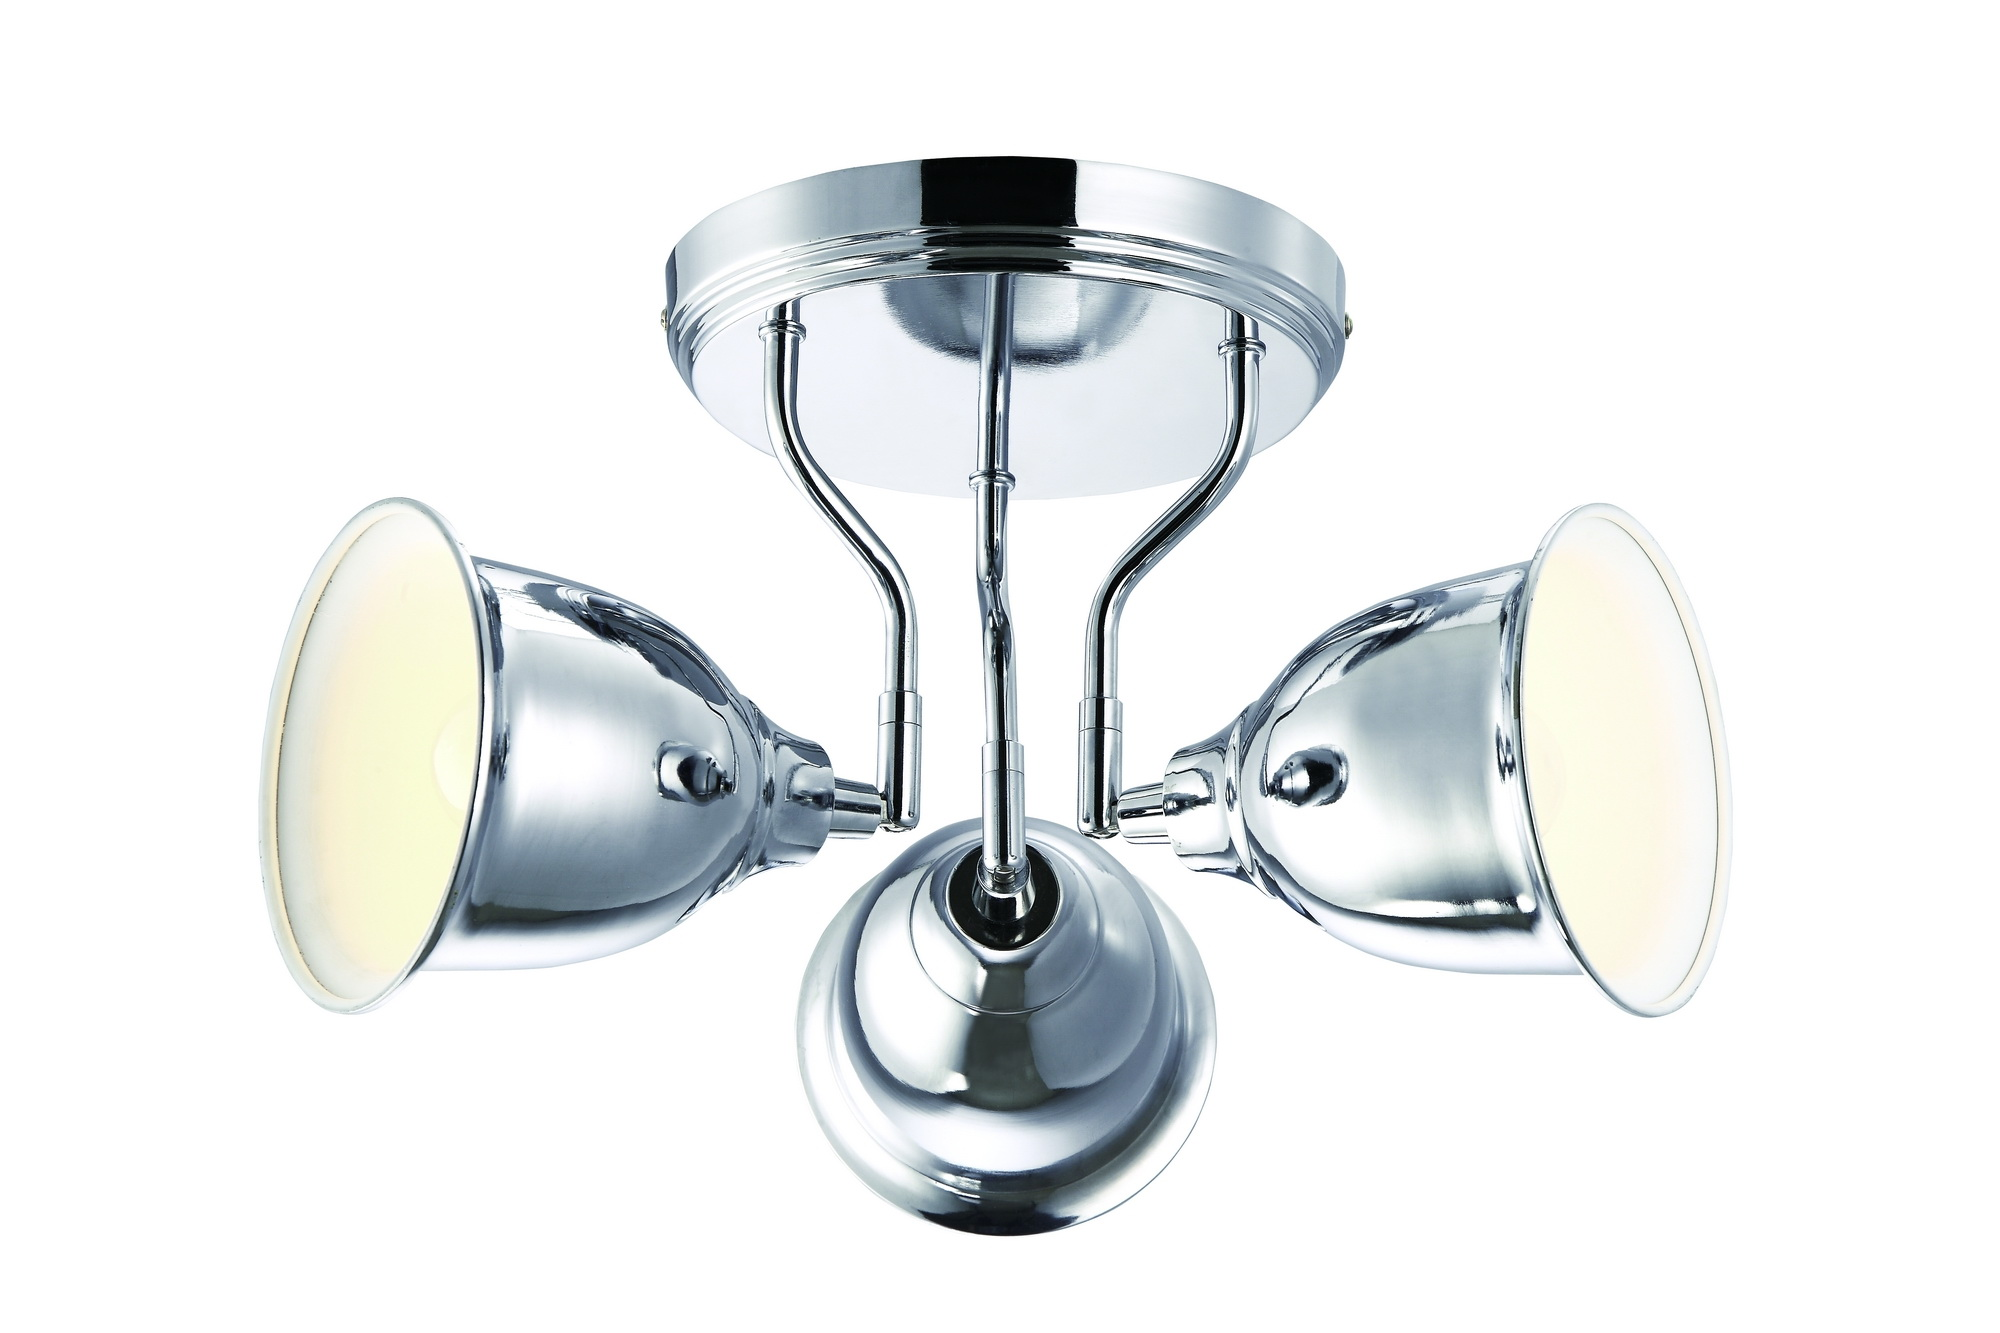 спот a9557pl 3cc arte lamp Люстра Arte lamp Campana a9557pl-3cc